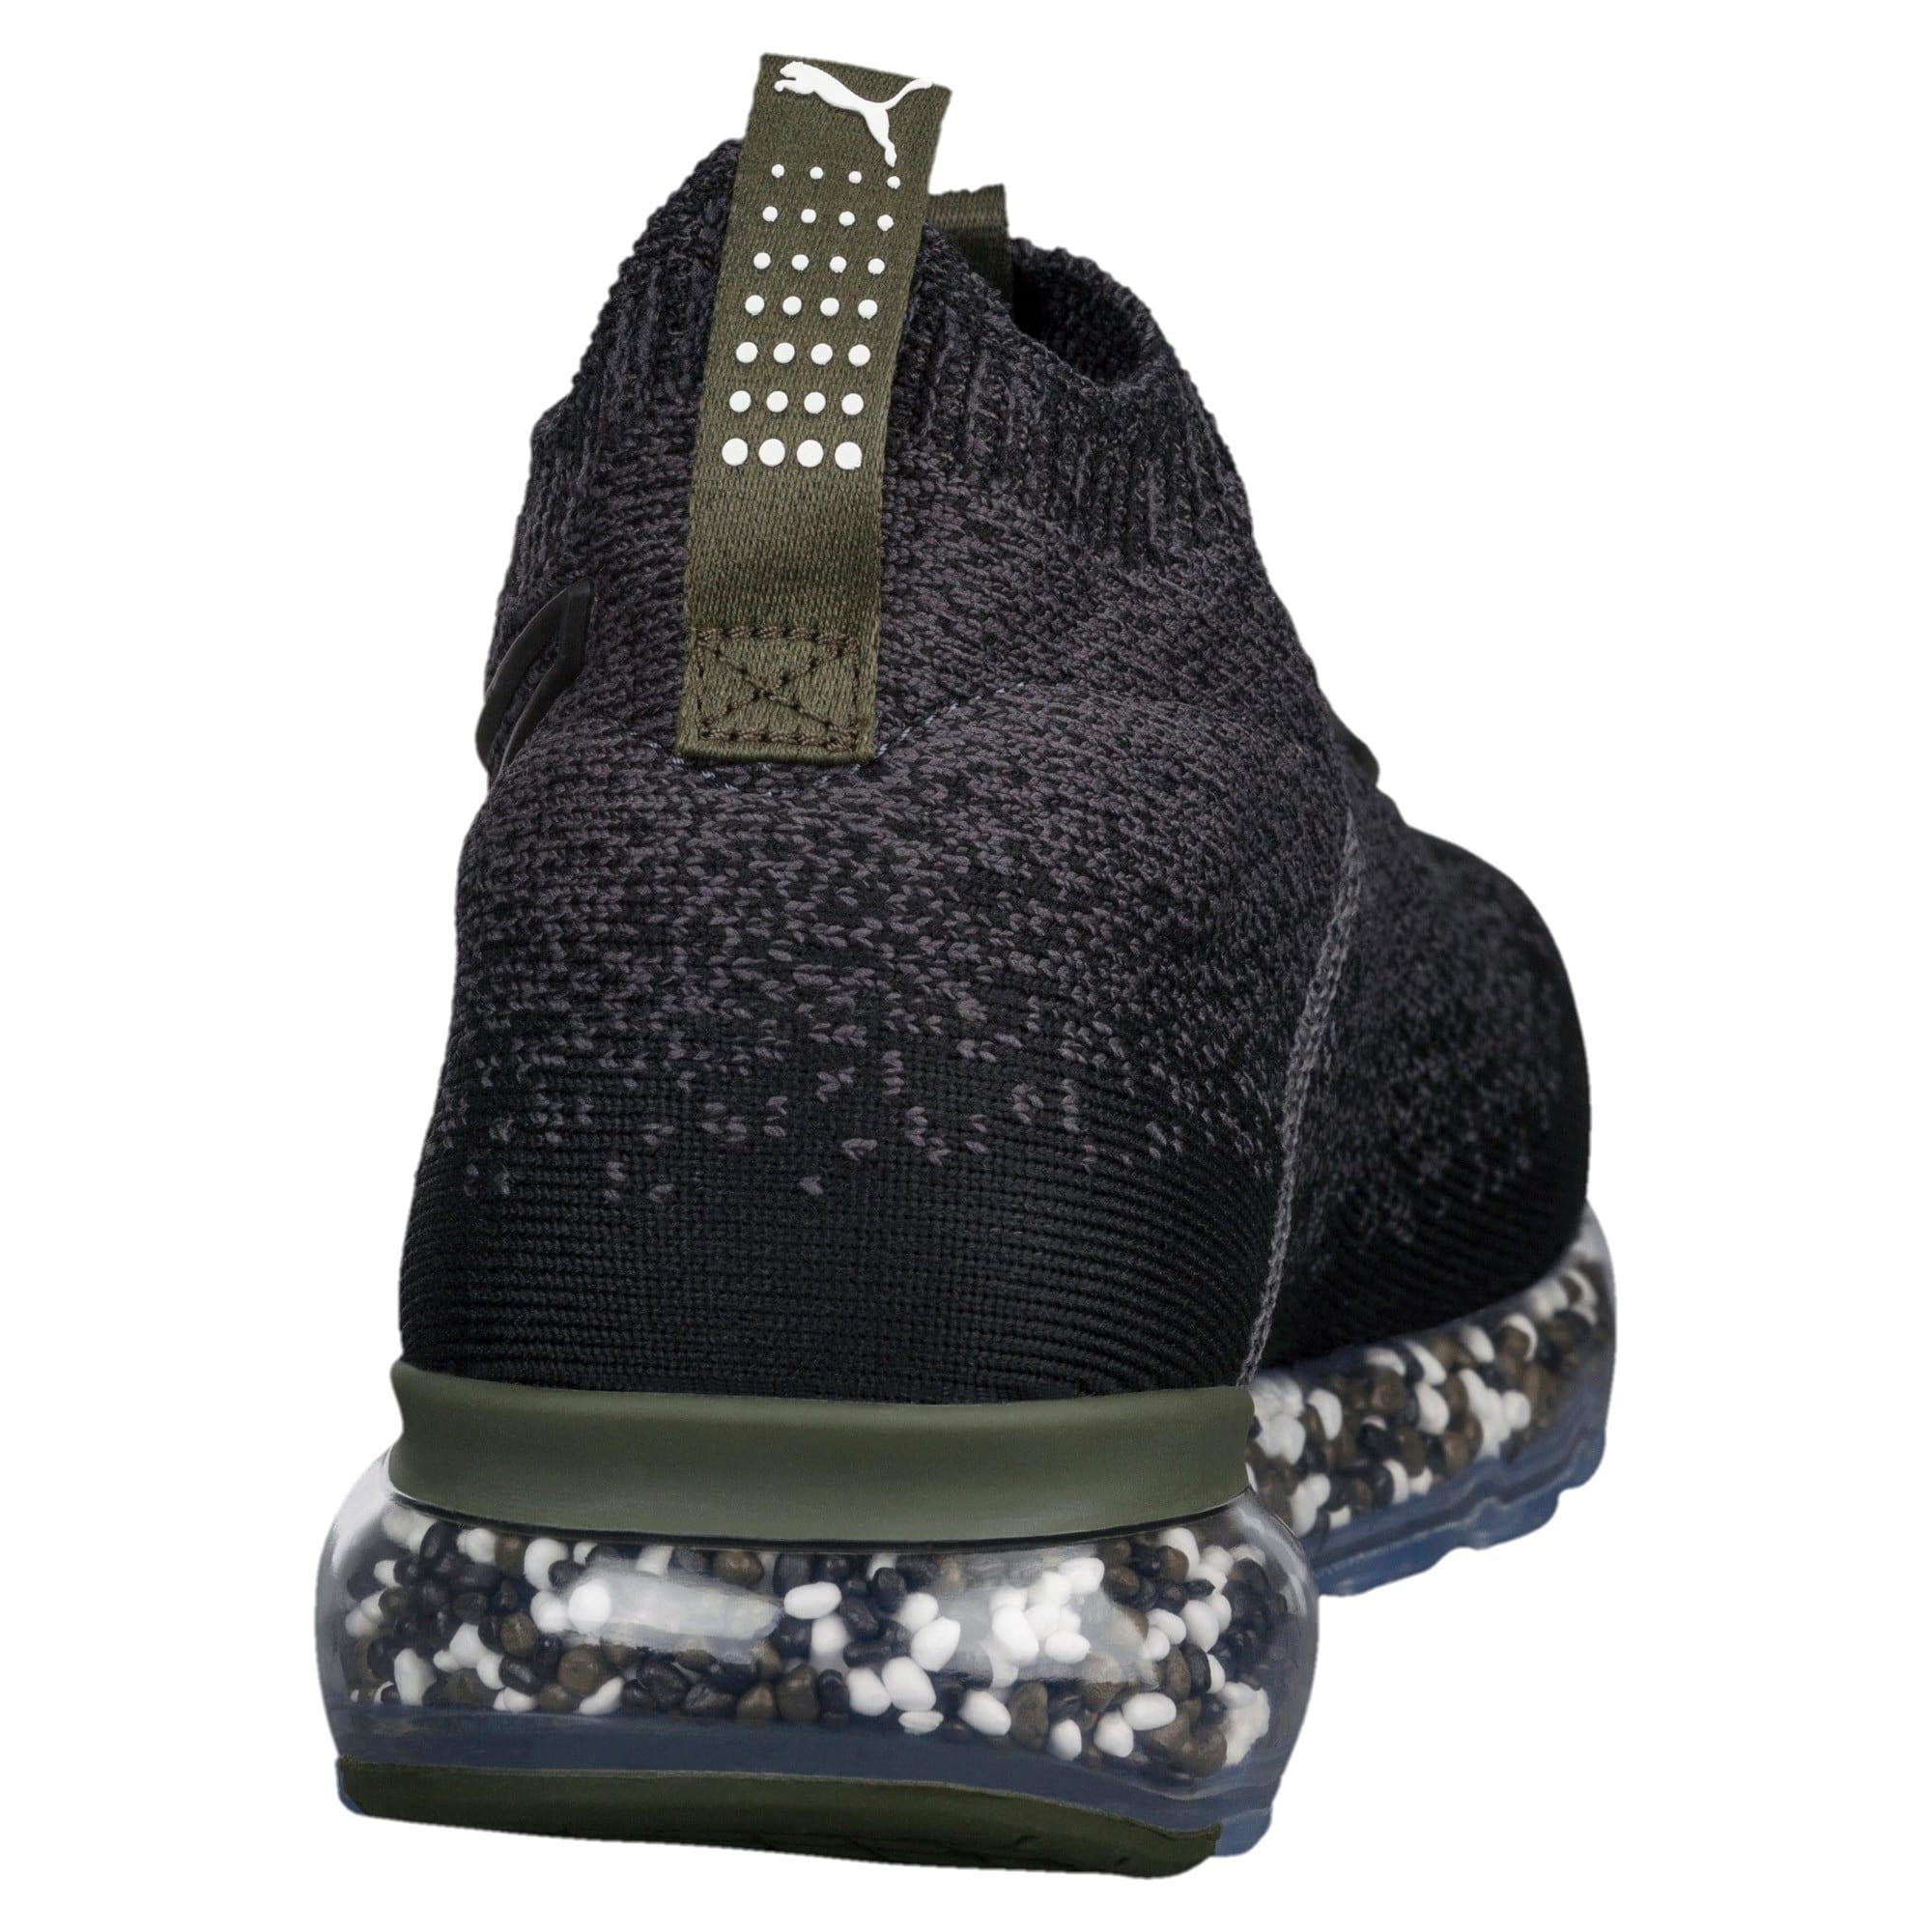 Thumbnail 4 of Jamming Women's Running Shoes, Puma Black-Forest Night, medium